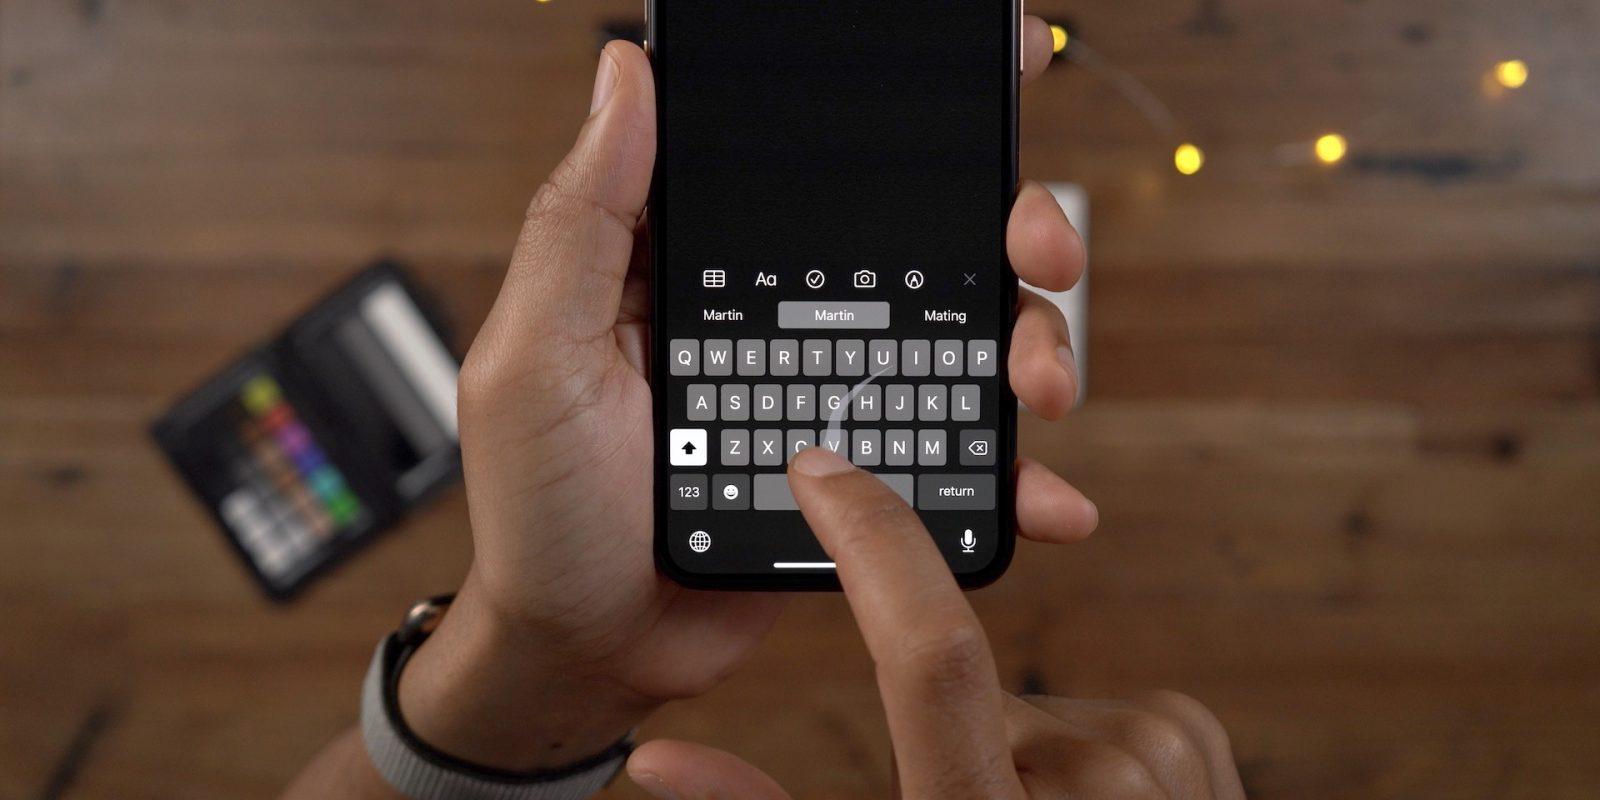 Apple releases iOS 13 developer beta 4